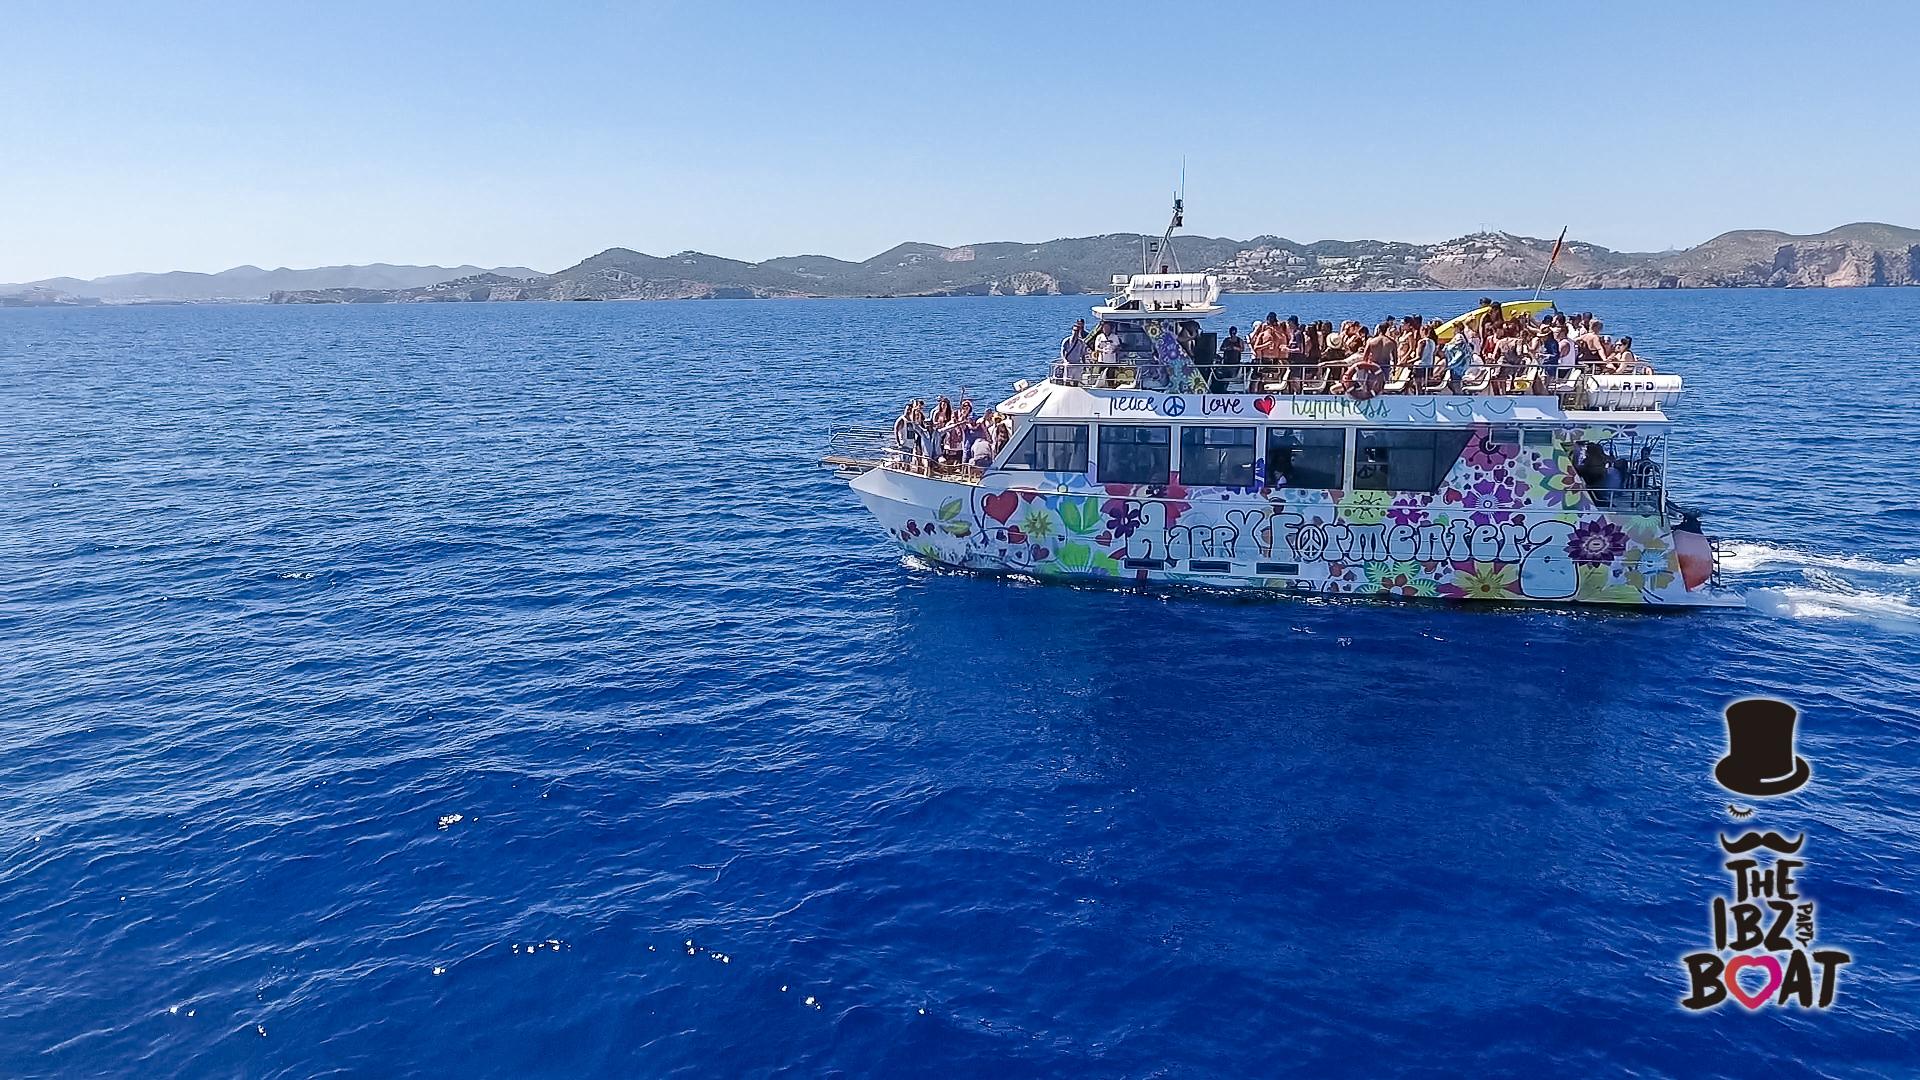 The Ibz Boat